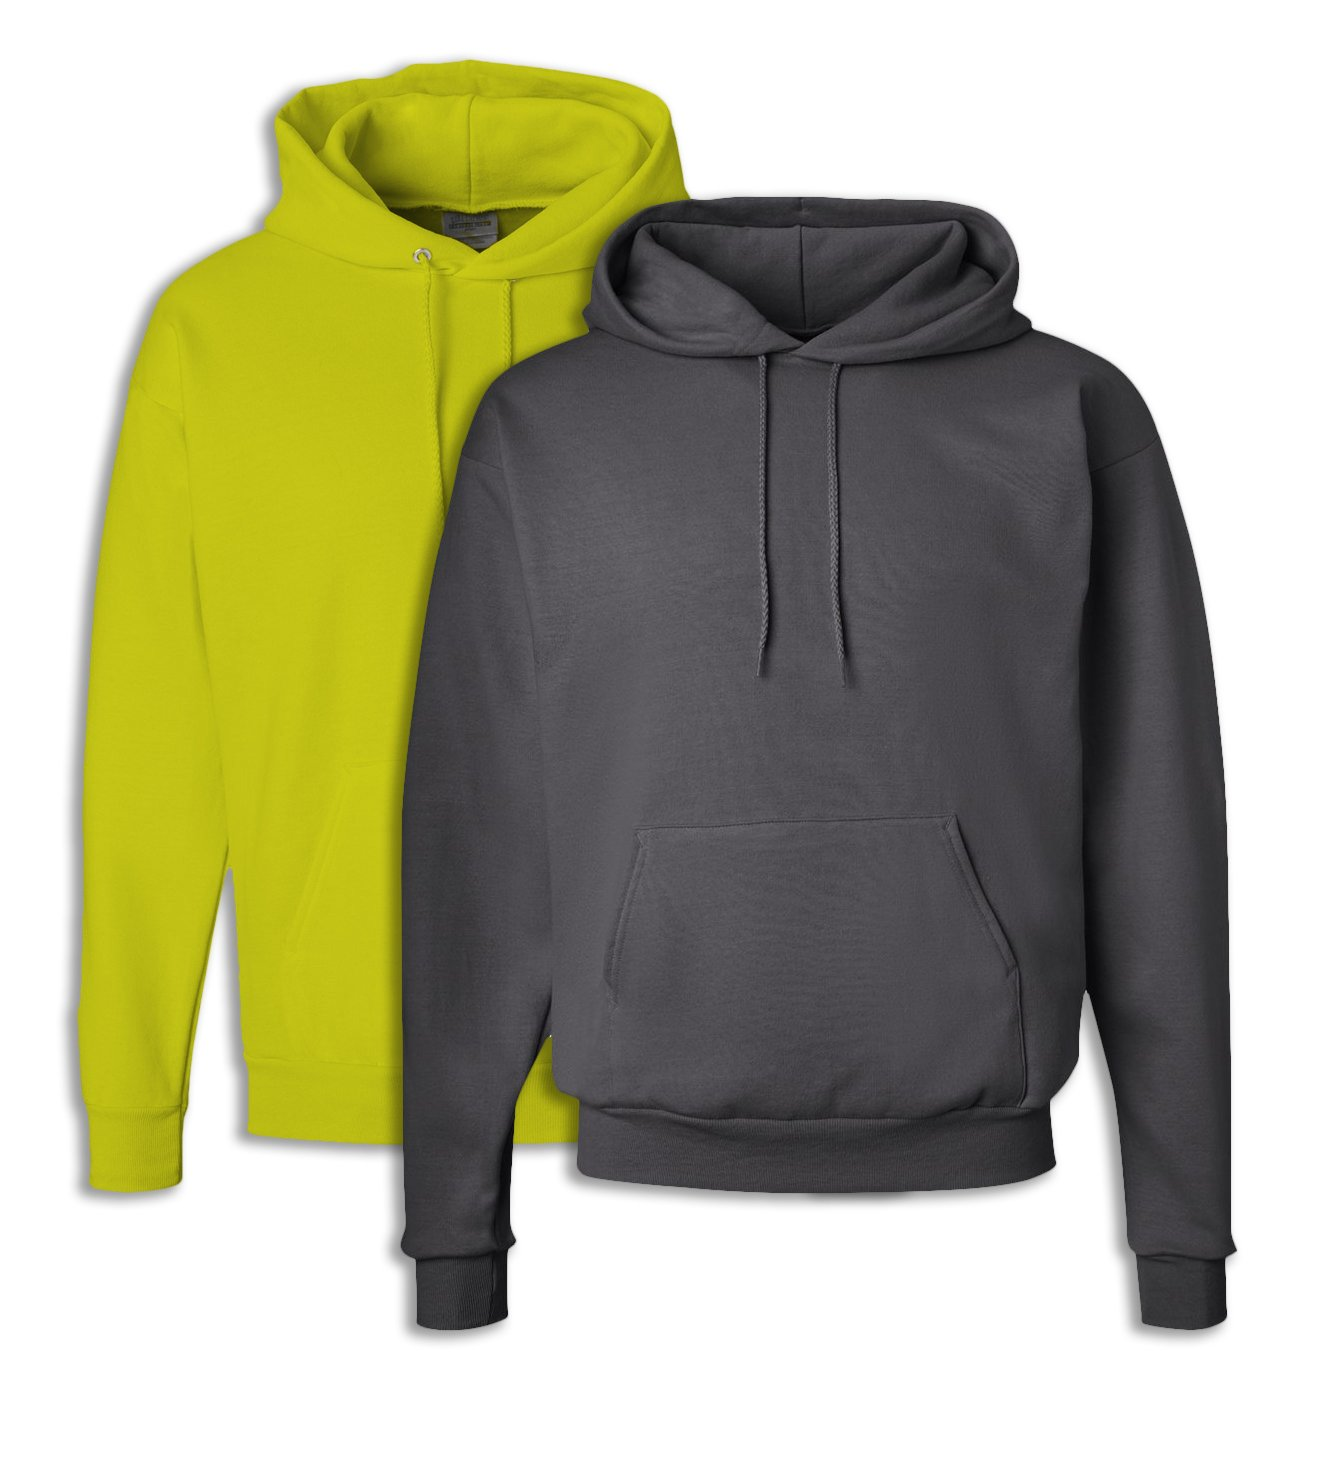 Hanes P170 Mens EcoSmart Hooded Sweatshirt Small 1 Safety Green + 1 Smoke Grey